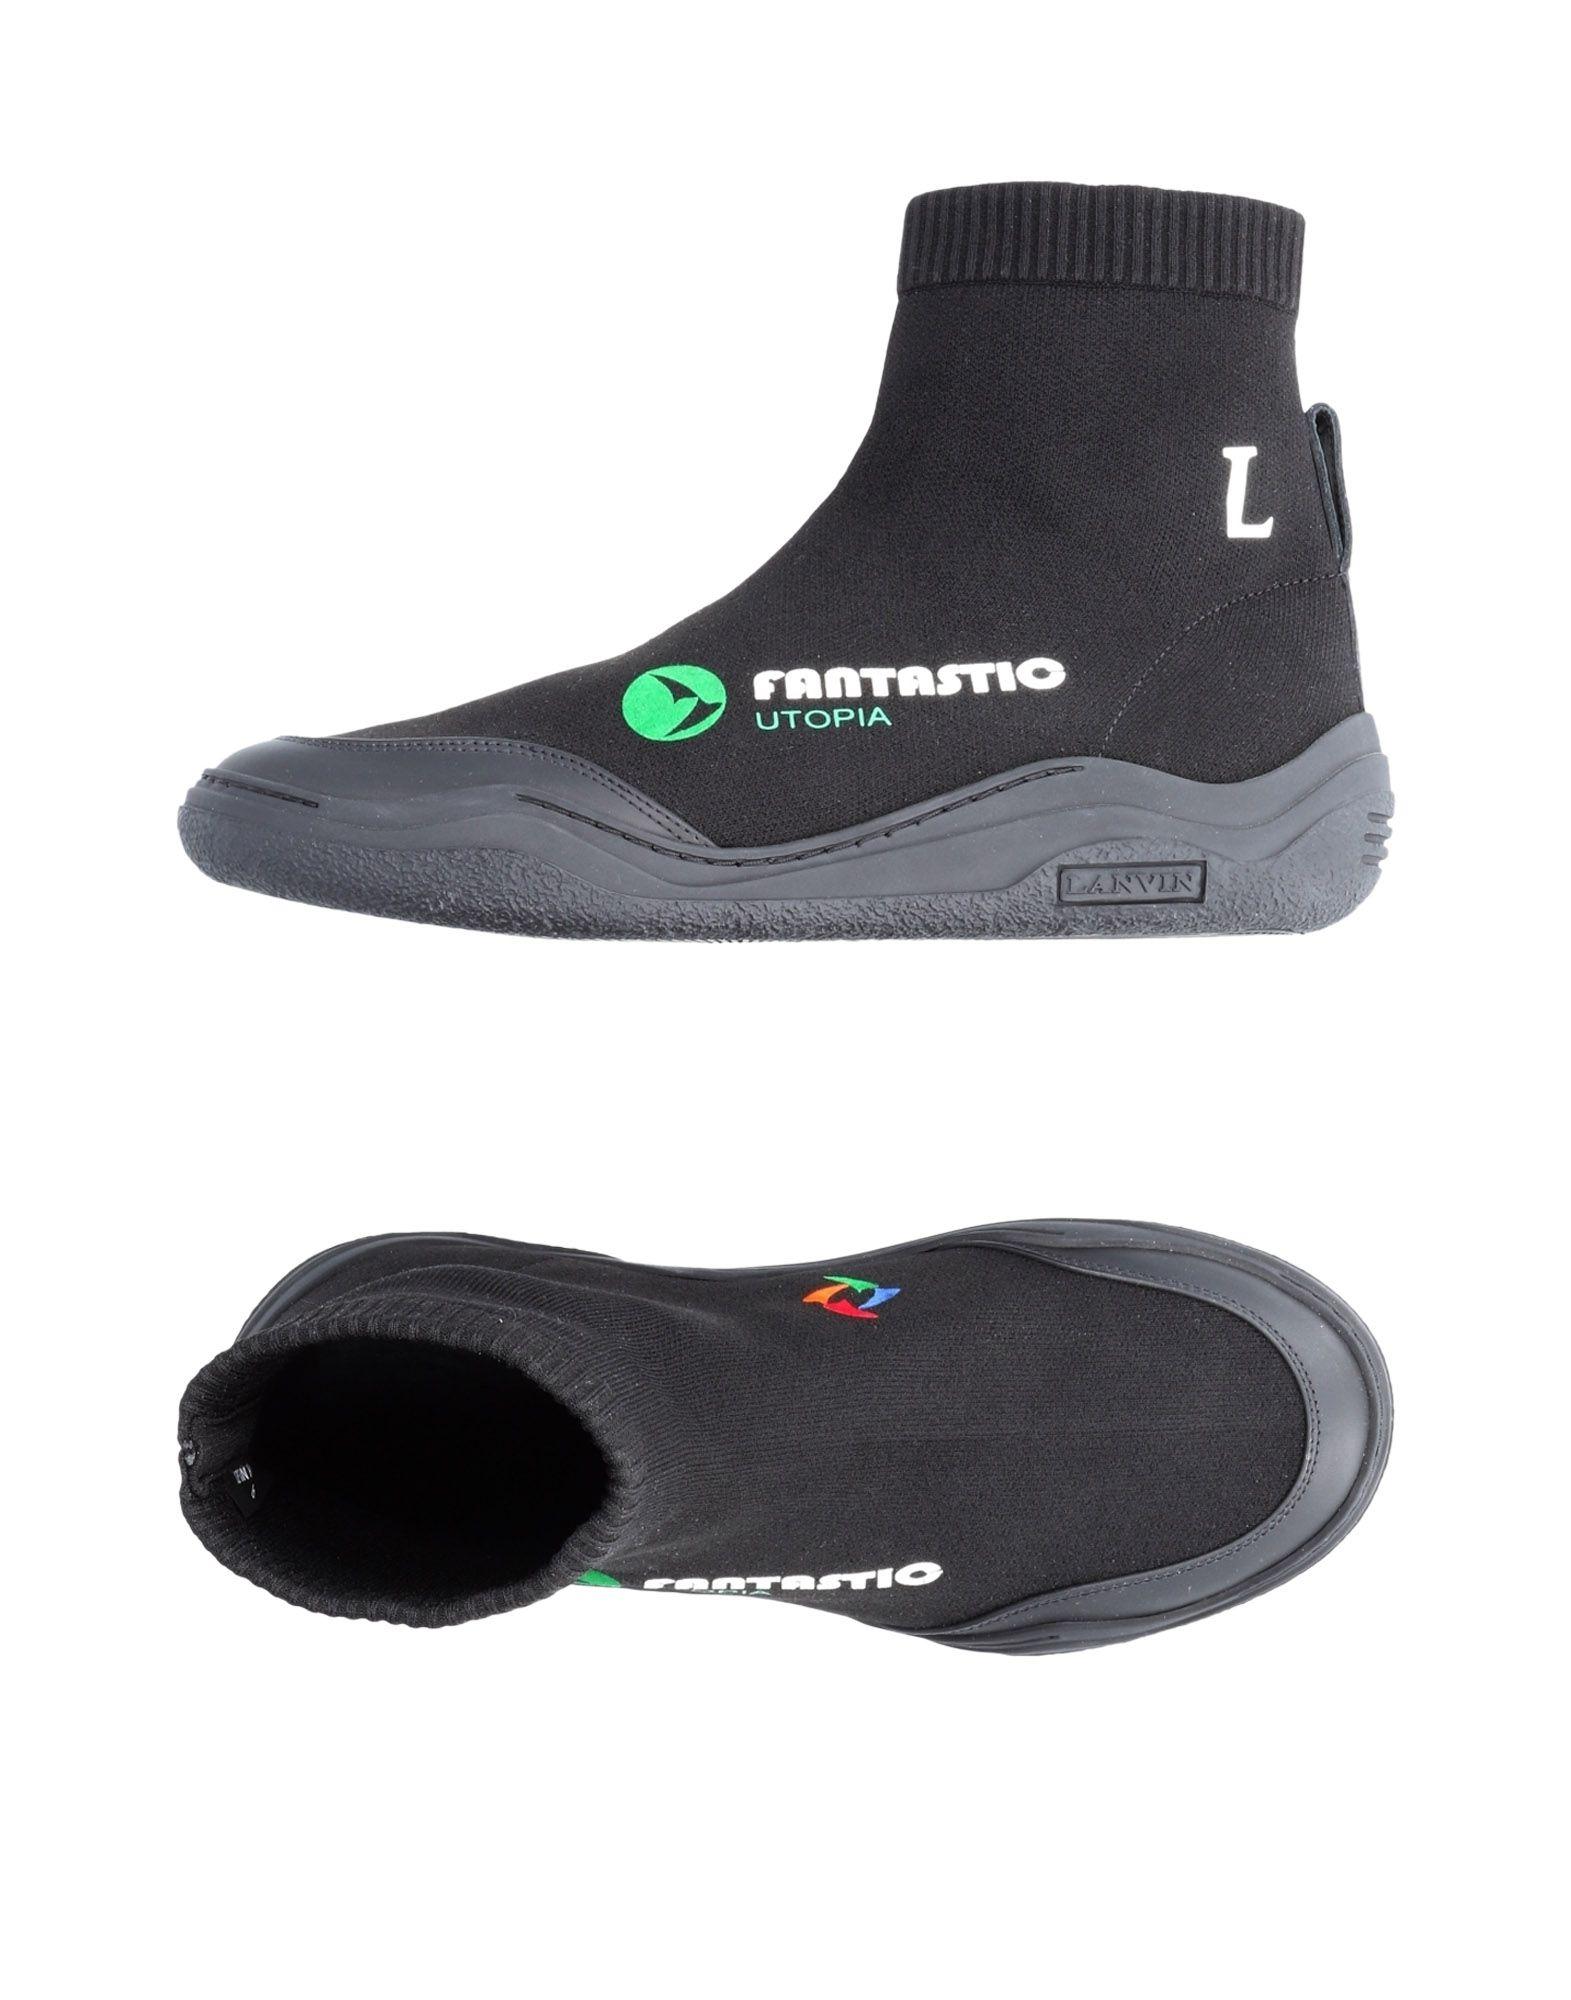 Lanvin Sneakers Herren  11463727VM Gute Qualität beliebte Schuhe